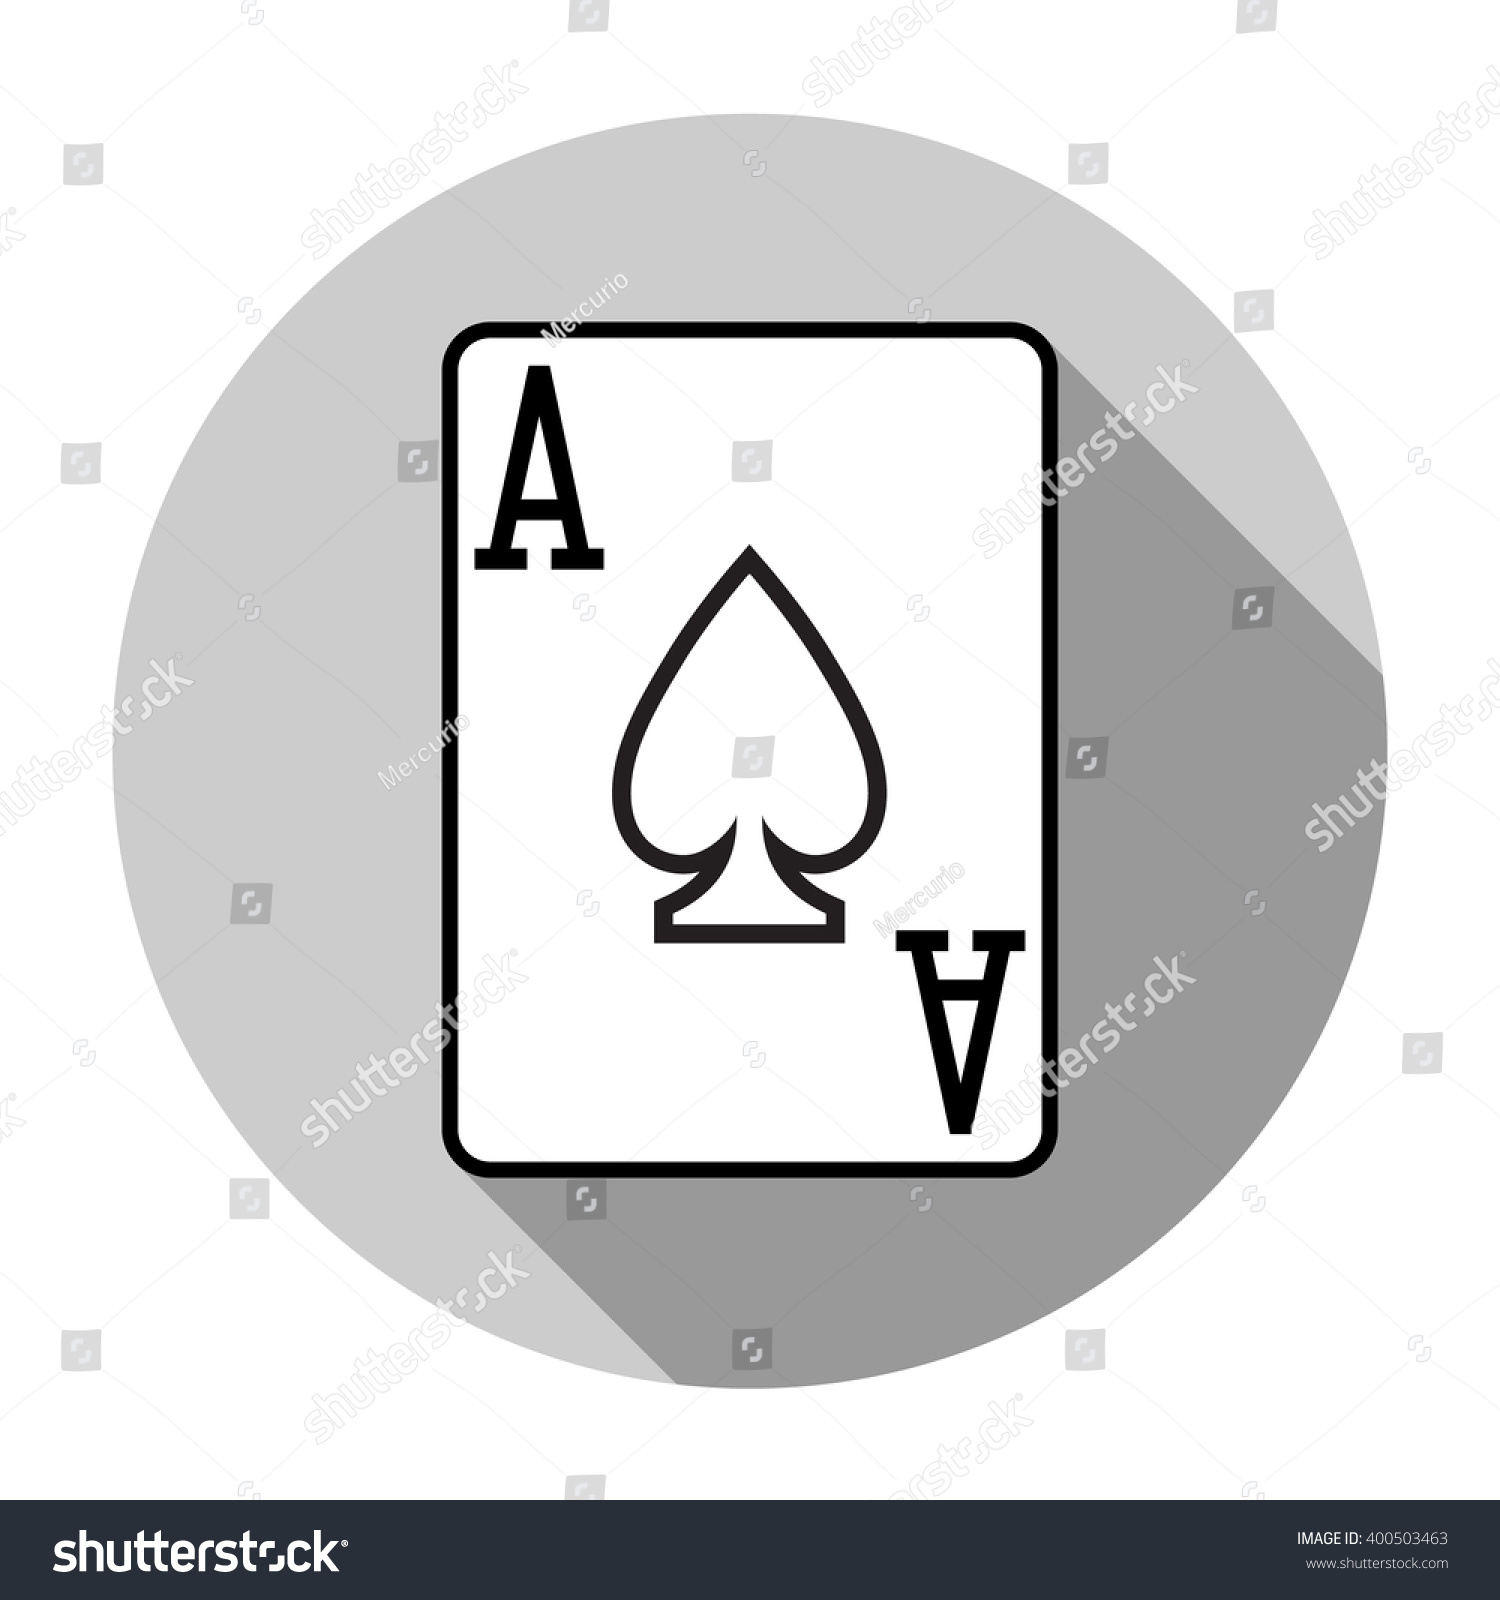 Flat design vector ace spades icon stock vector 400503463 shutterstock biocorpaavc Choice Image